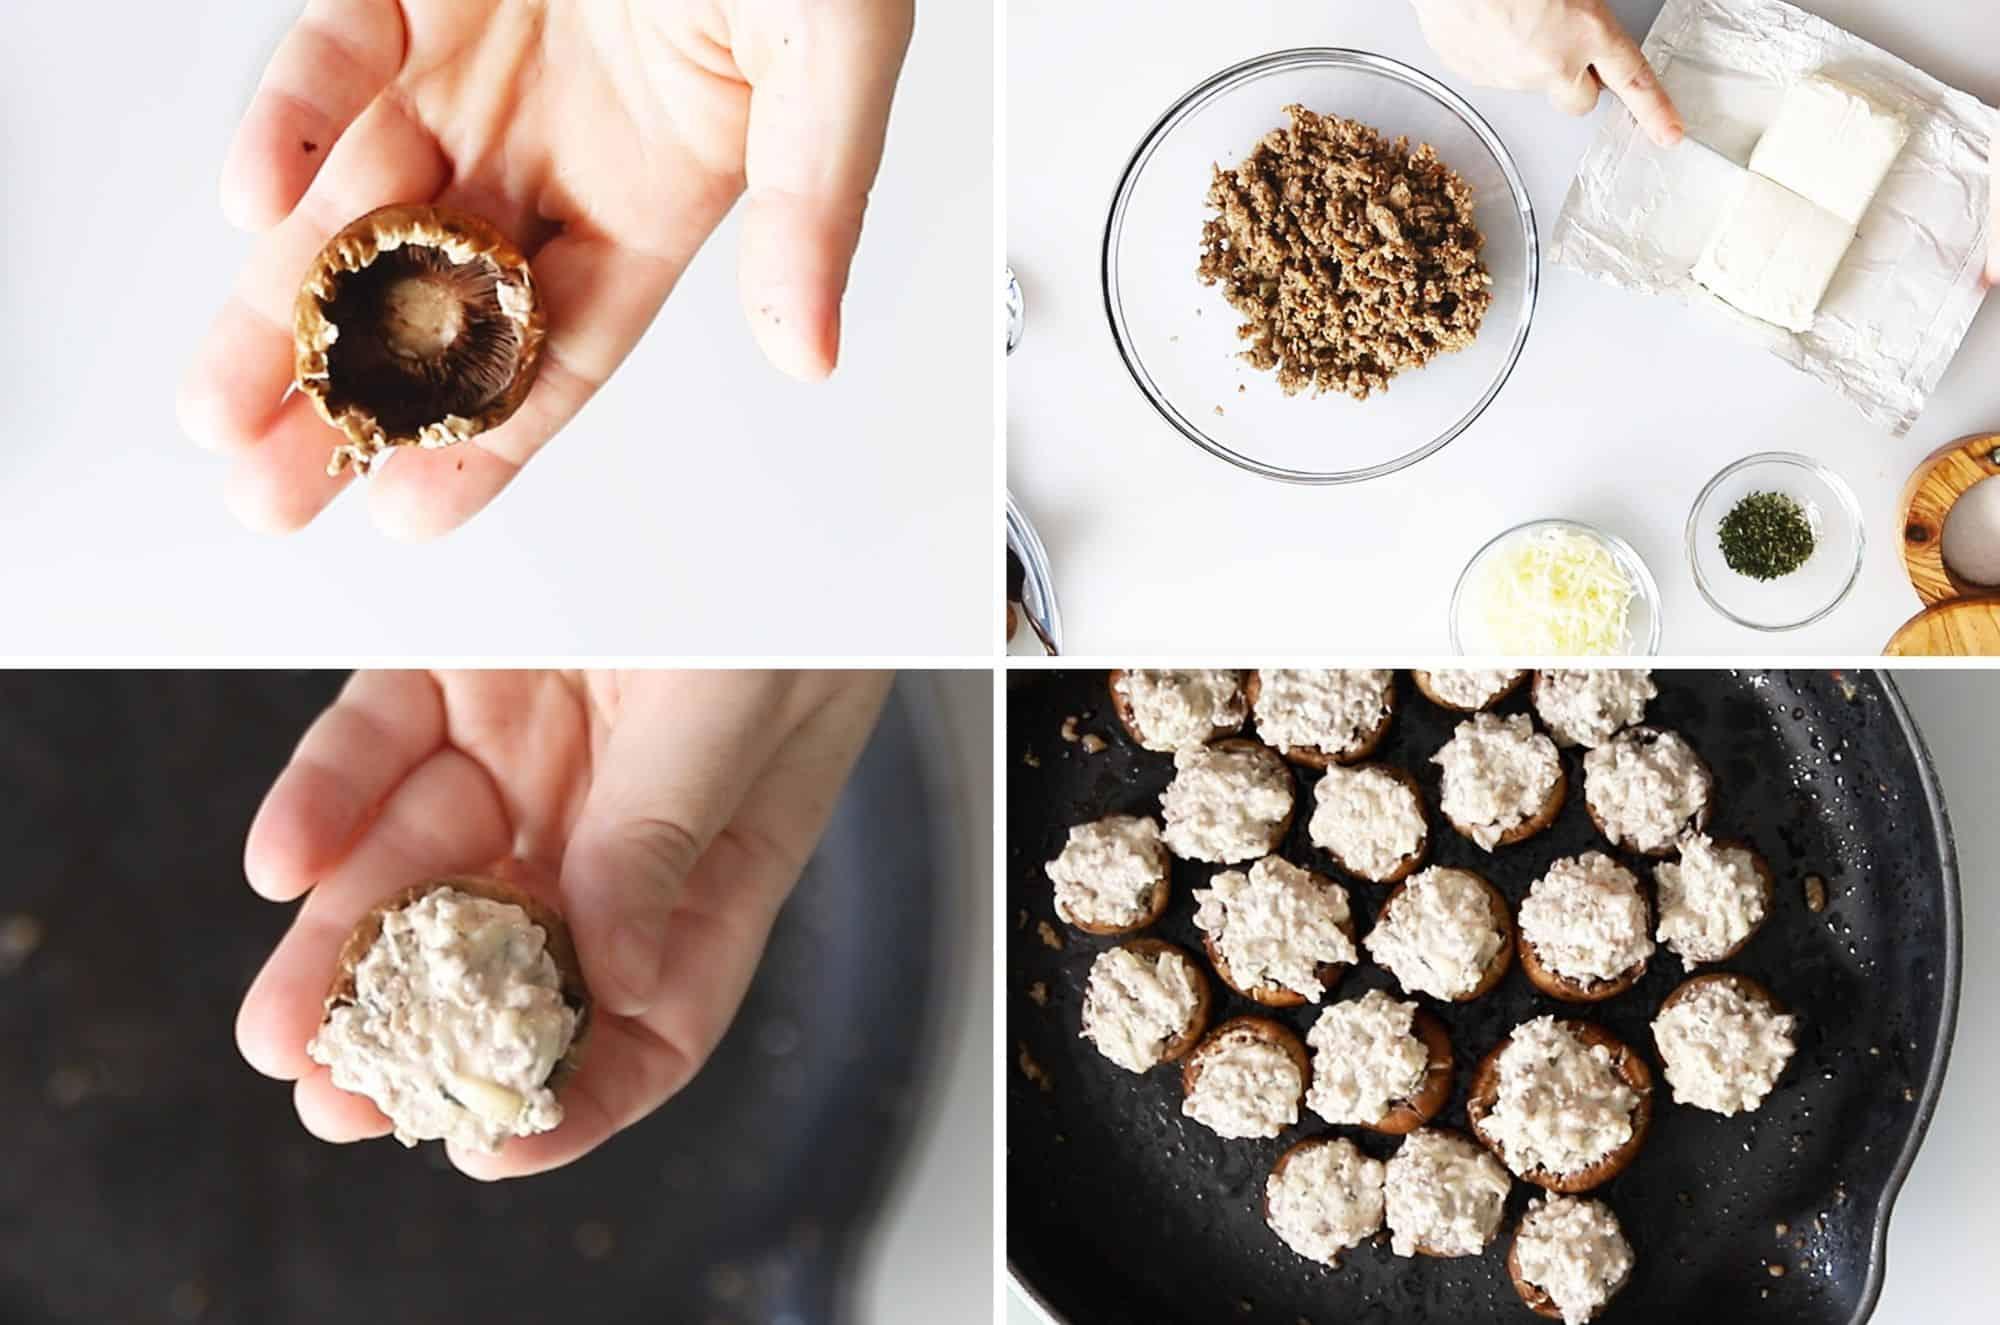 process for filling stuffed mushrooms